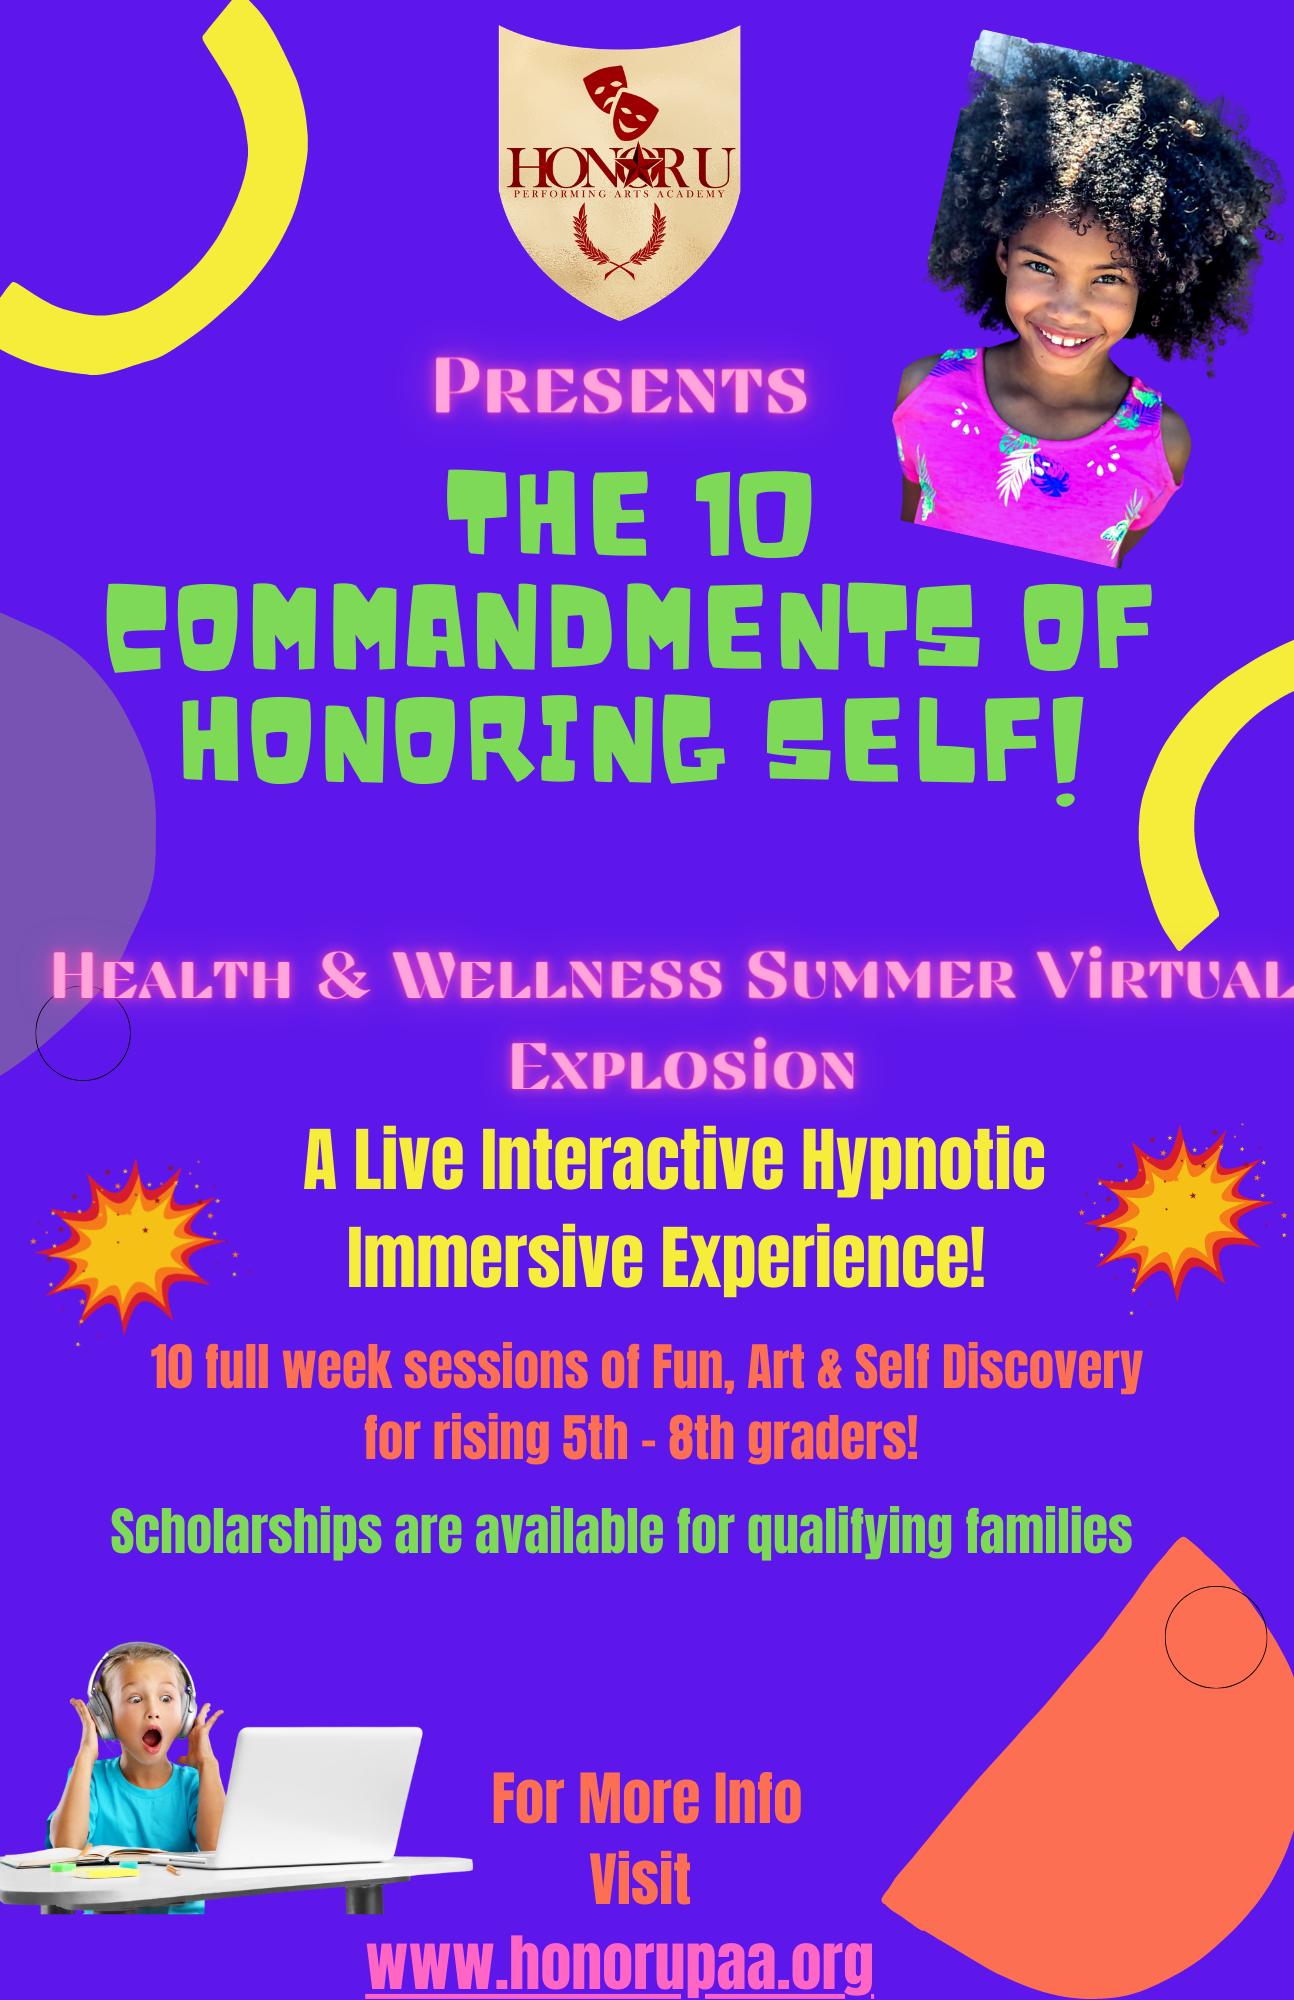 The 10 Commandments of Honoring Self!